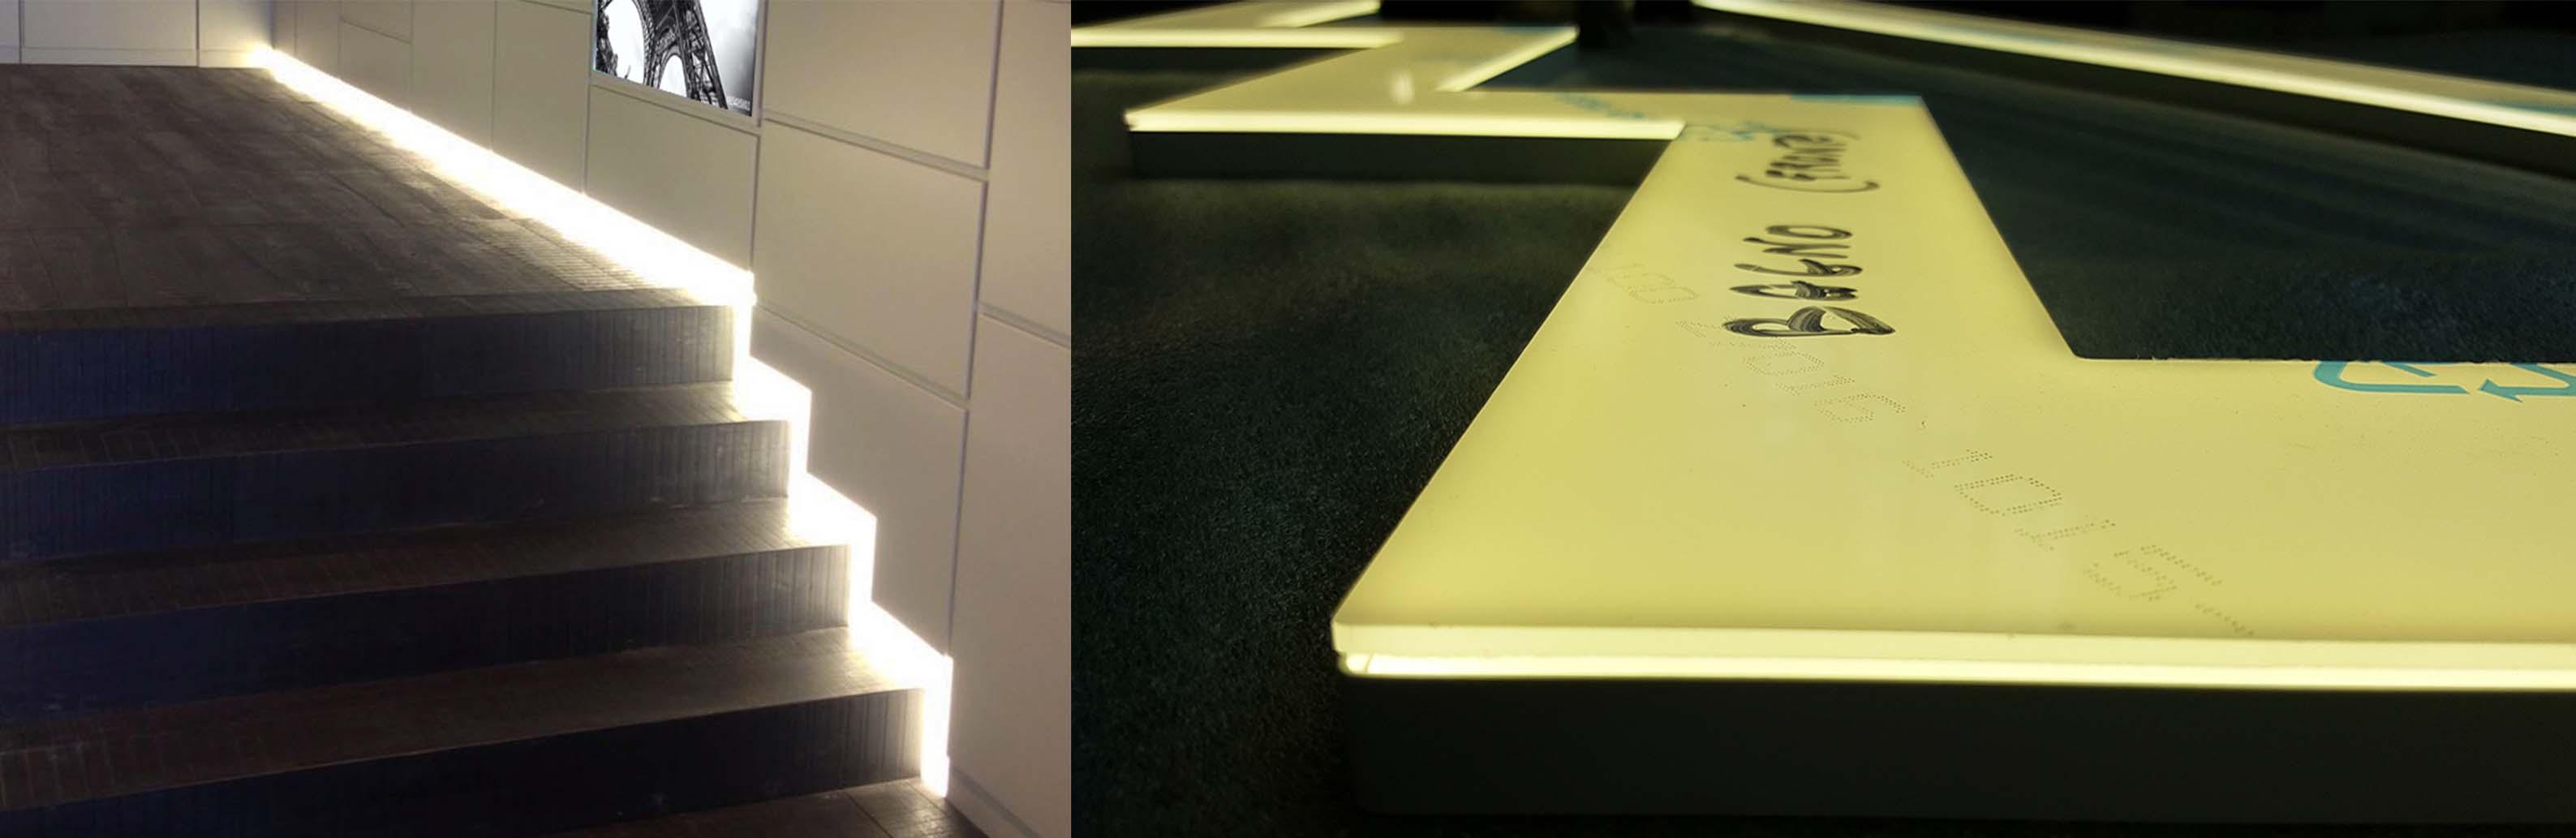 Pannelli Luminosi a Led - Photoled